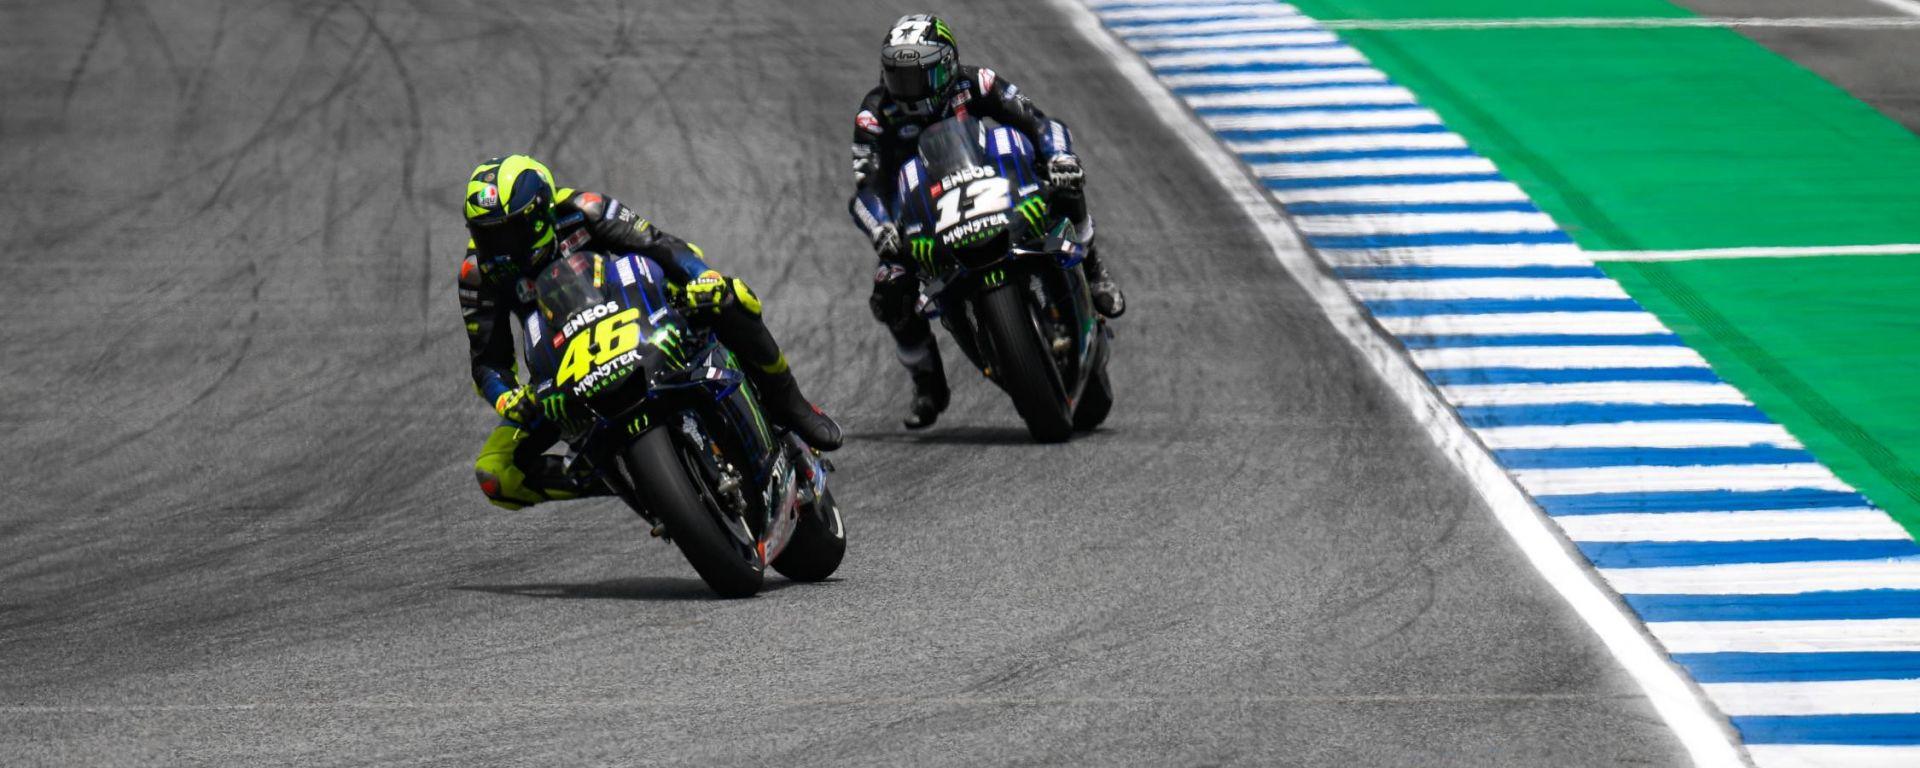 MotoGP Thailandia 2019, Buriram: Valentino Rossi e Maverick Vinales (Yamaha)